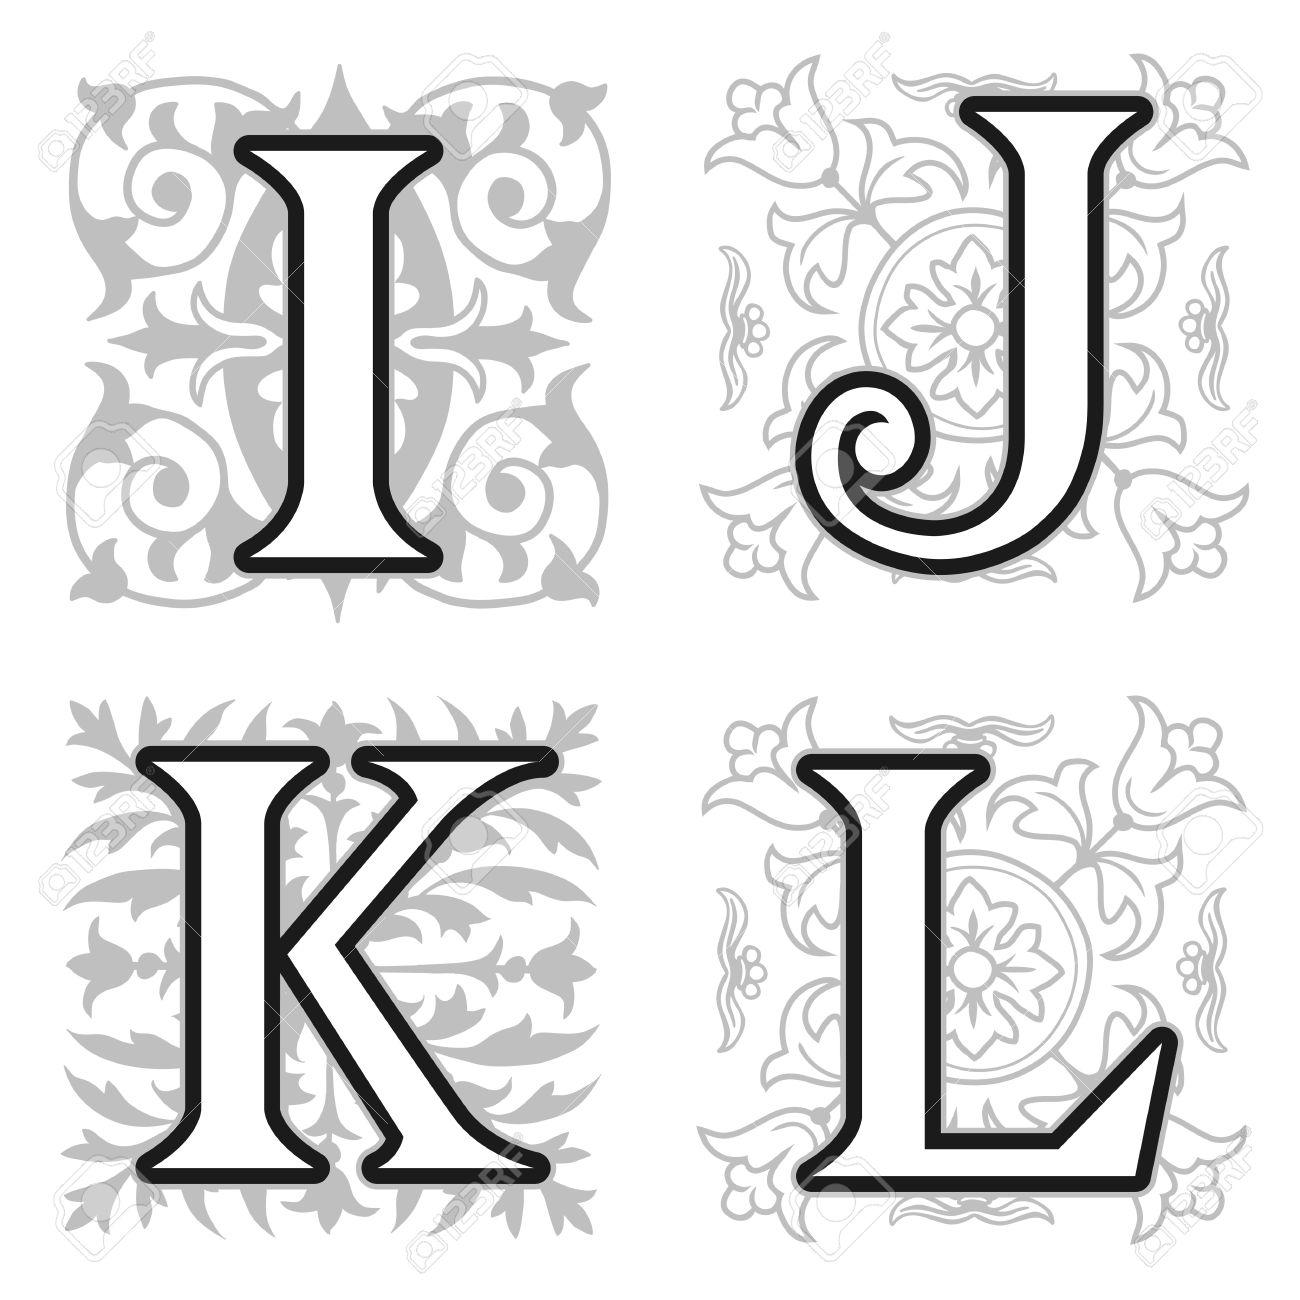 Decorative I J K L Alphabet Letters With Vintage Floral Elements In Different